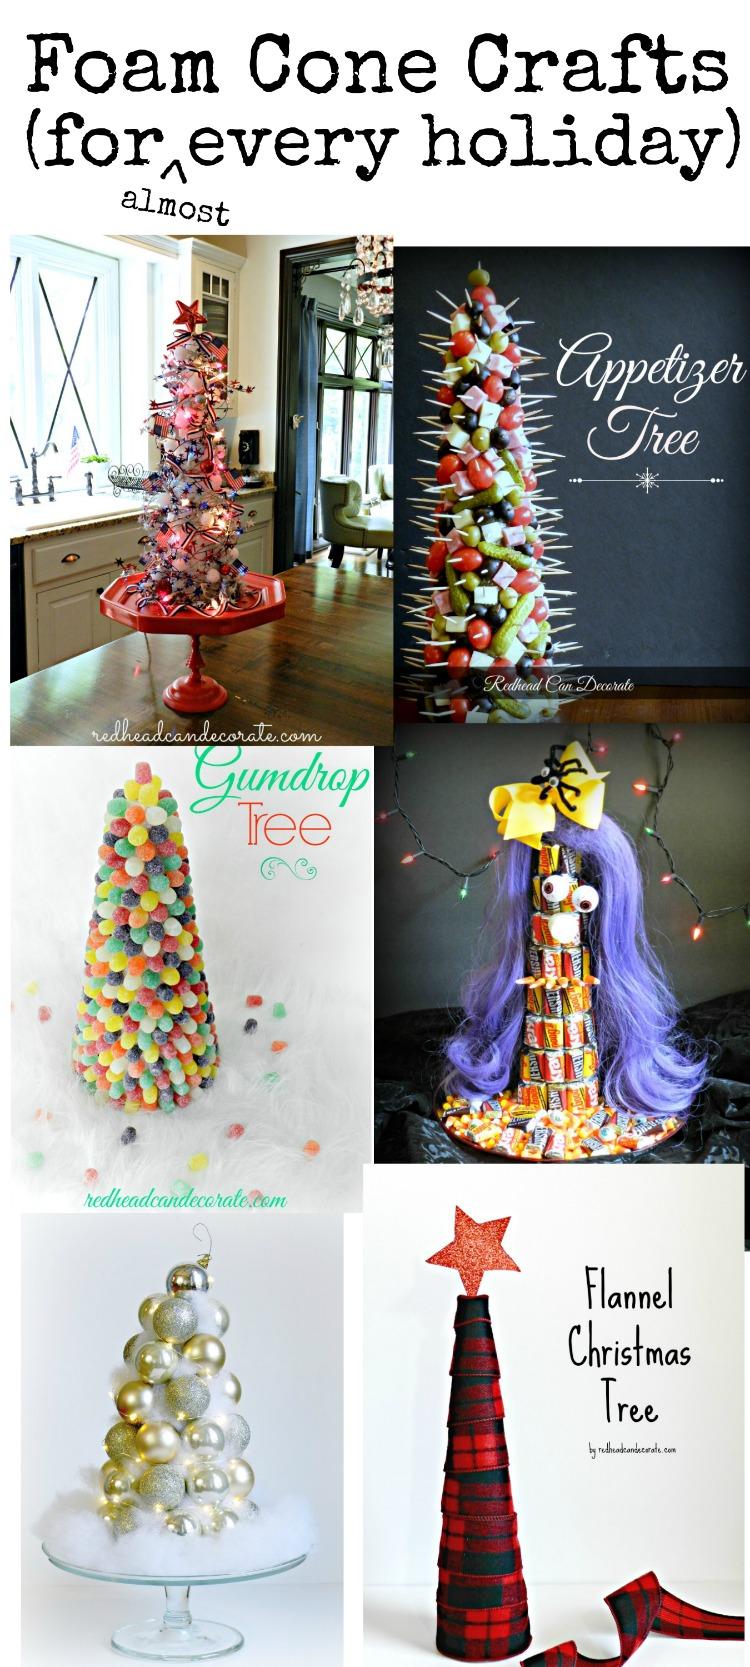 Foam Cone Holiday Crafts